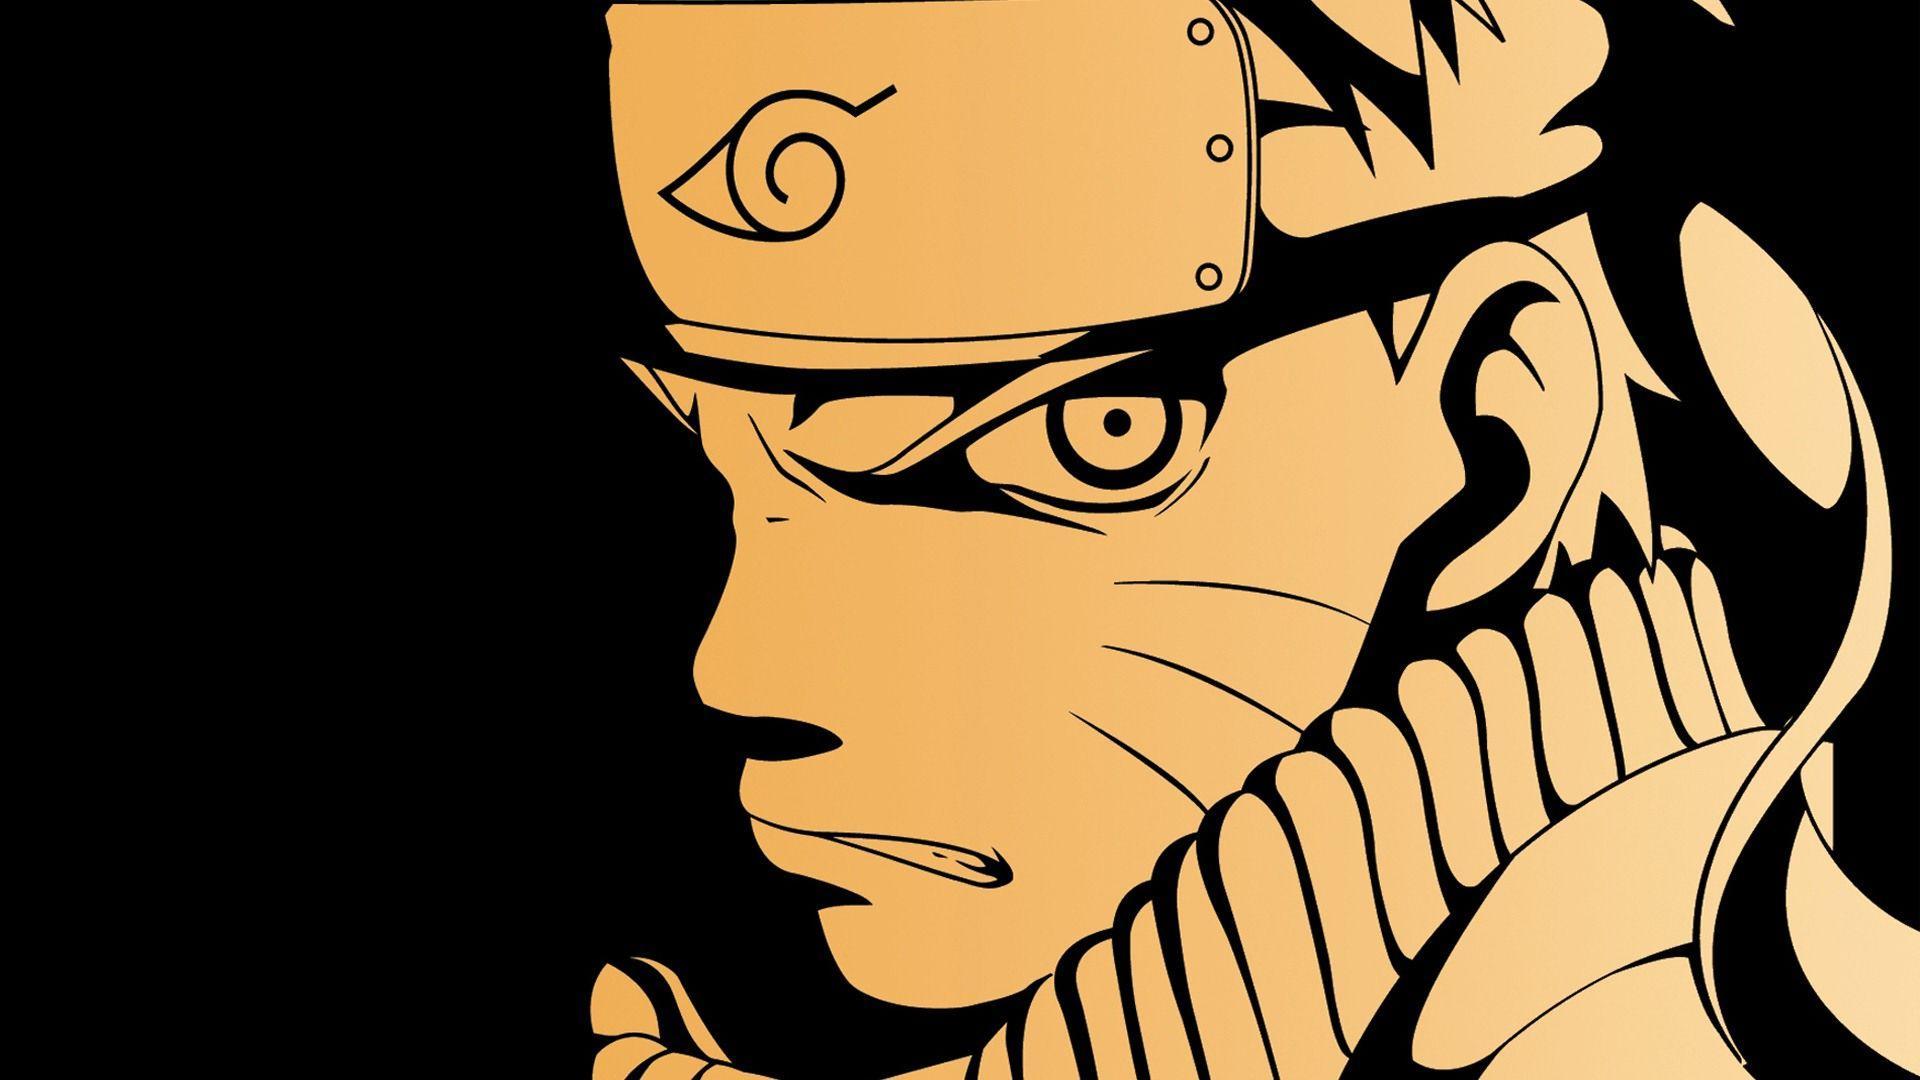 Download Wallpaper Naruto Hypebeast - ia4UwQq  Image_521333.jpg